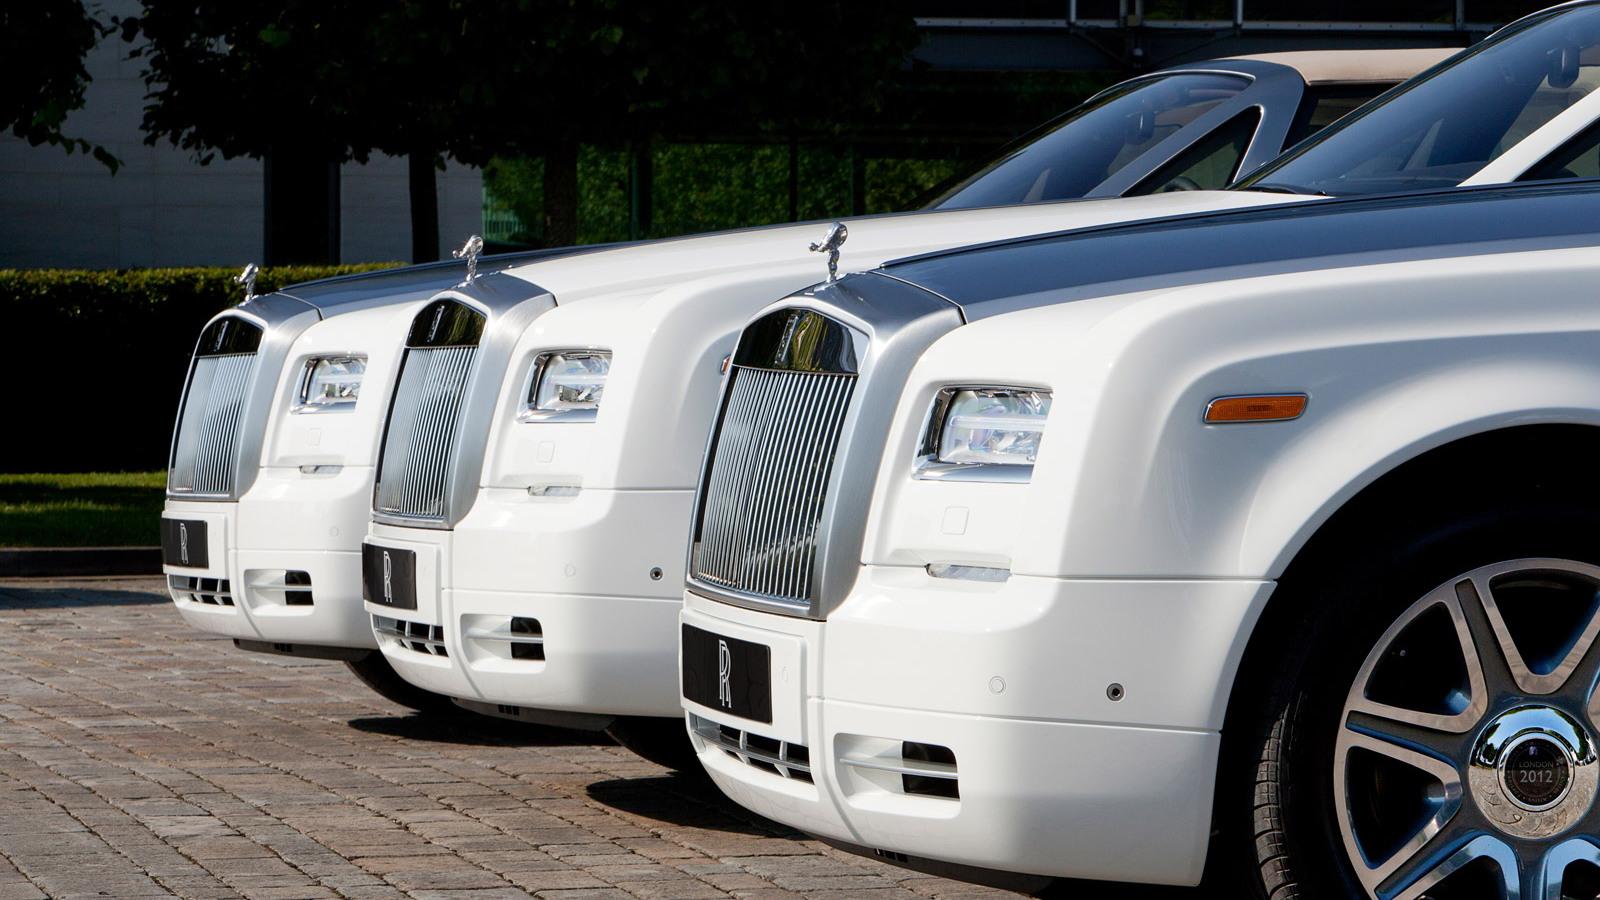 Rolls-Royce Phantom Drophead Coupe Series II 2012 London Olympics special edition